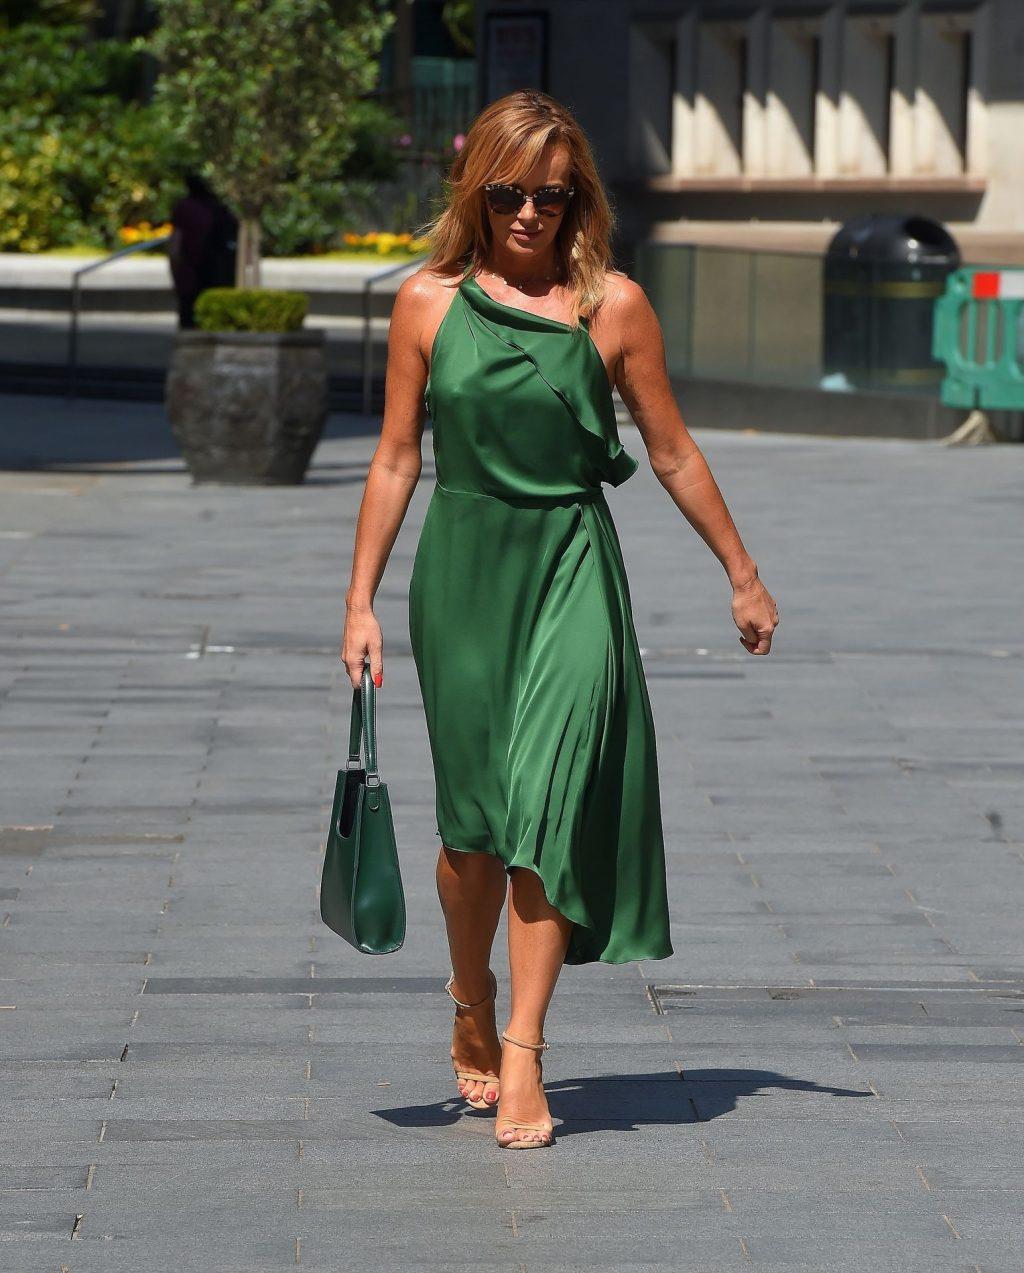 Amanda Holden Flaunts Her Tits in London (47 Photos)